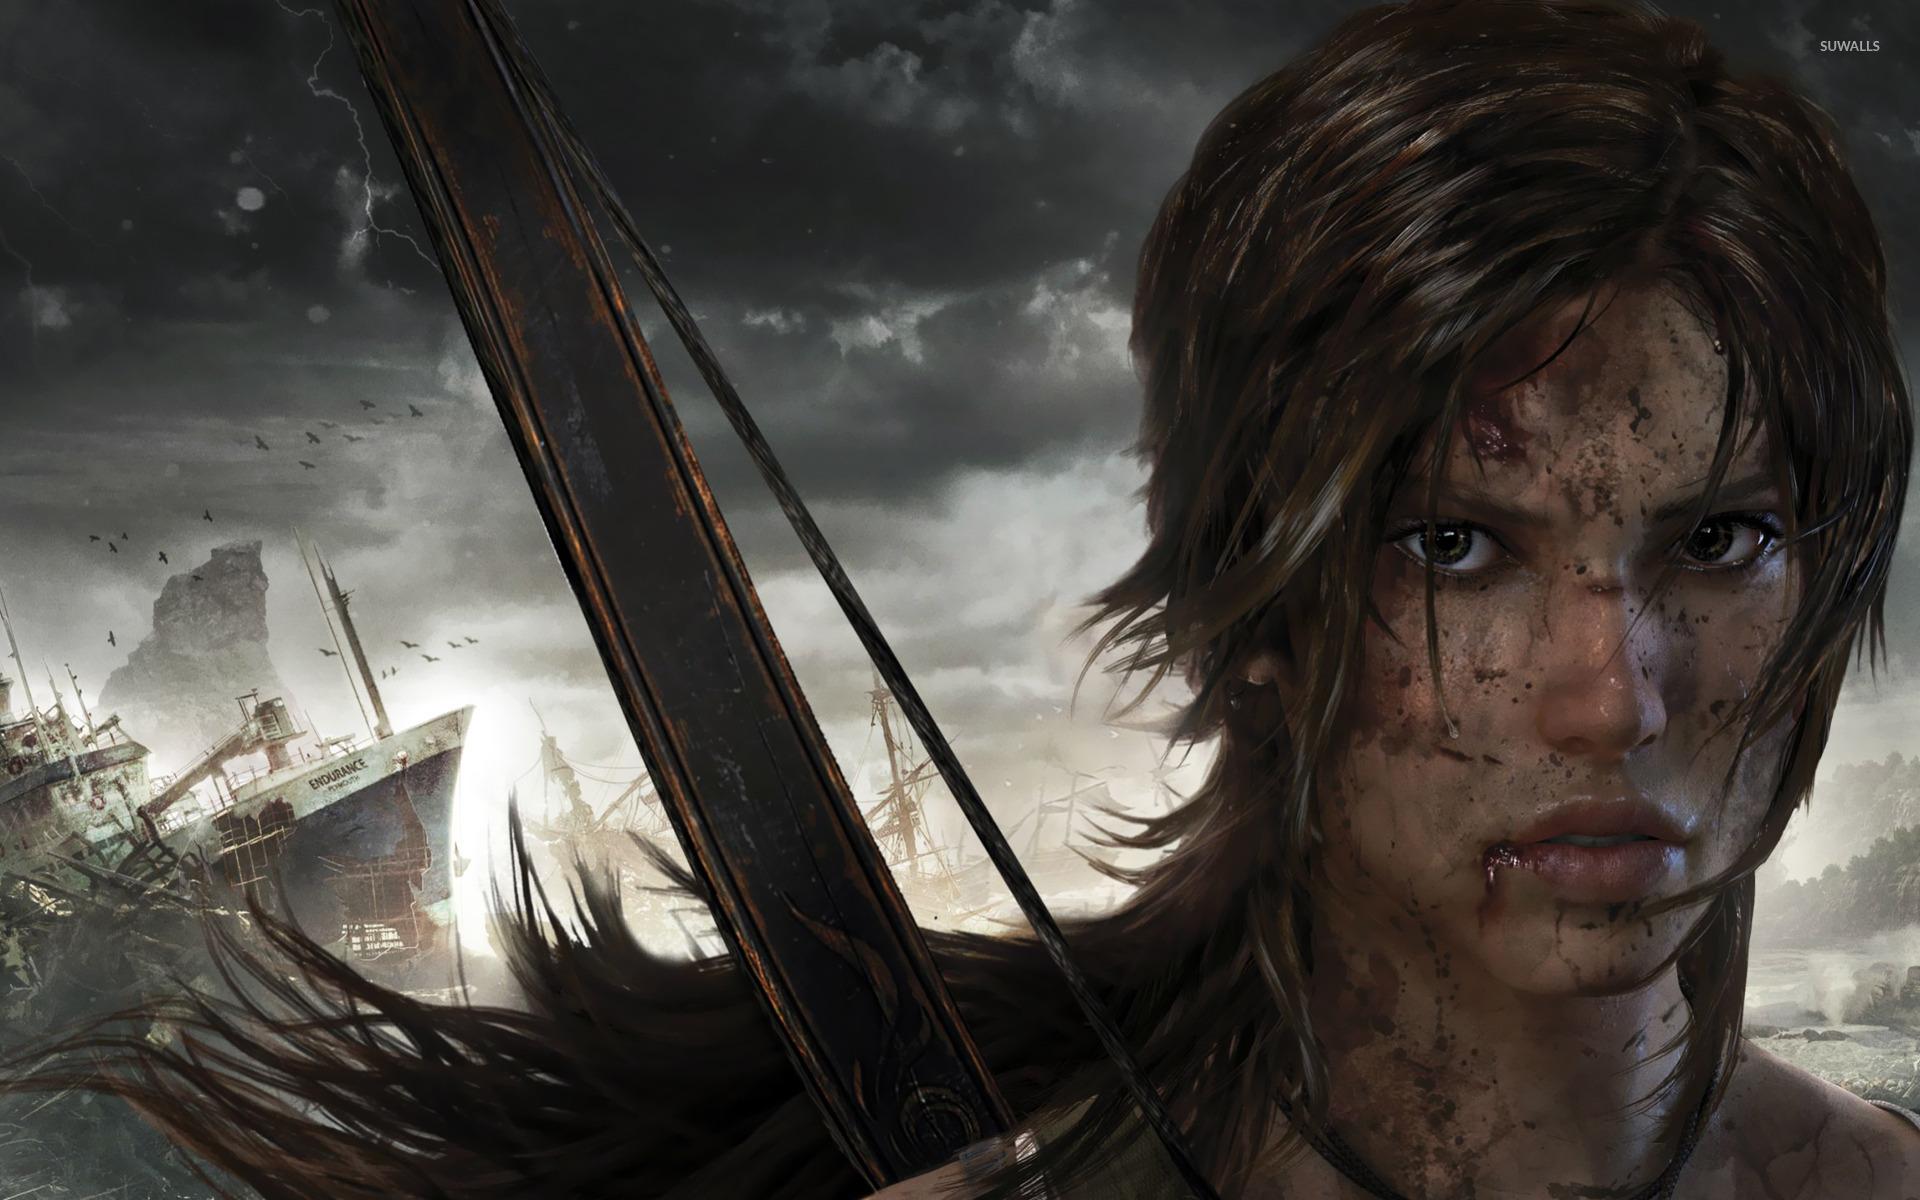 Lara Croft Tomb Raider 2 Wallpaper Game Wallpapers